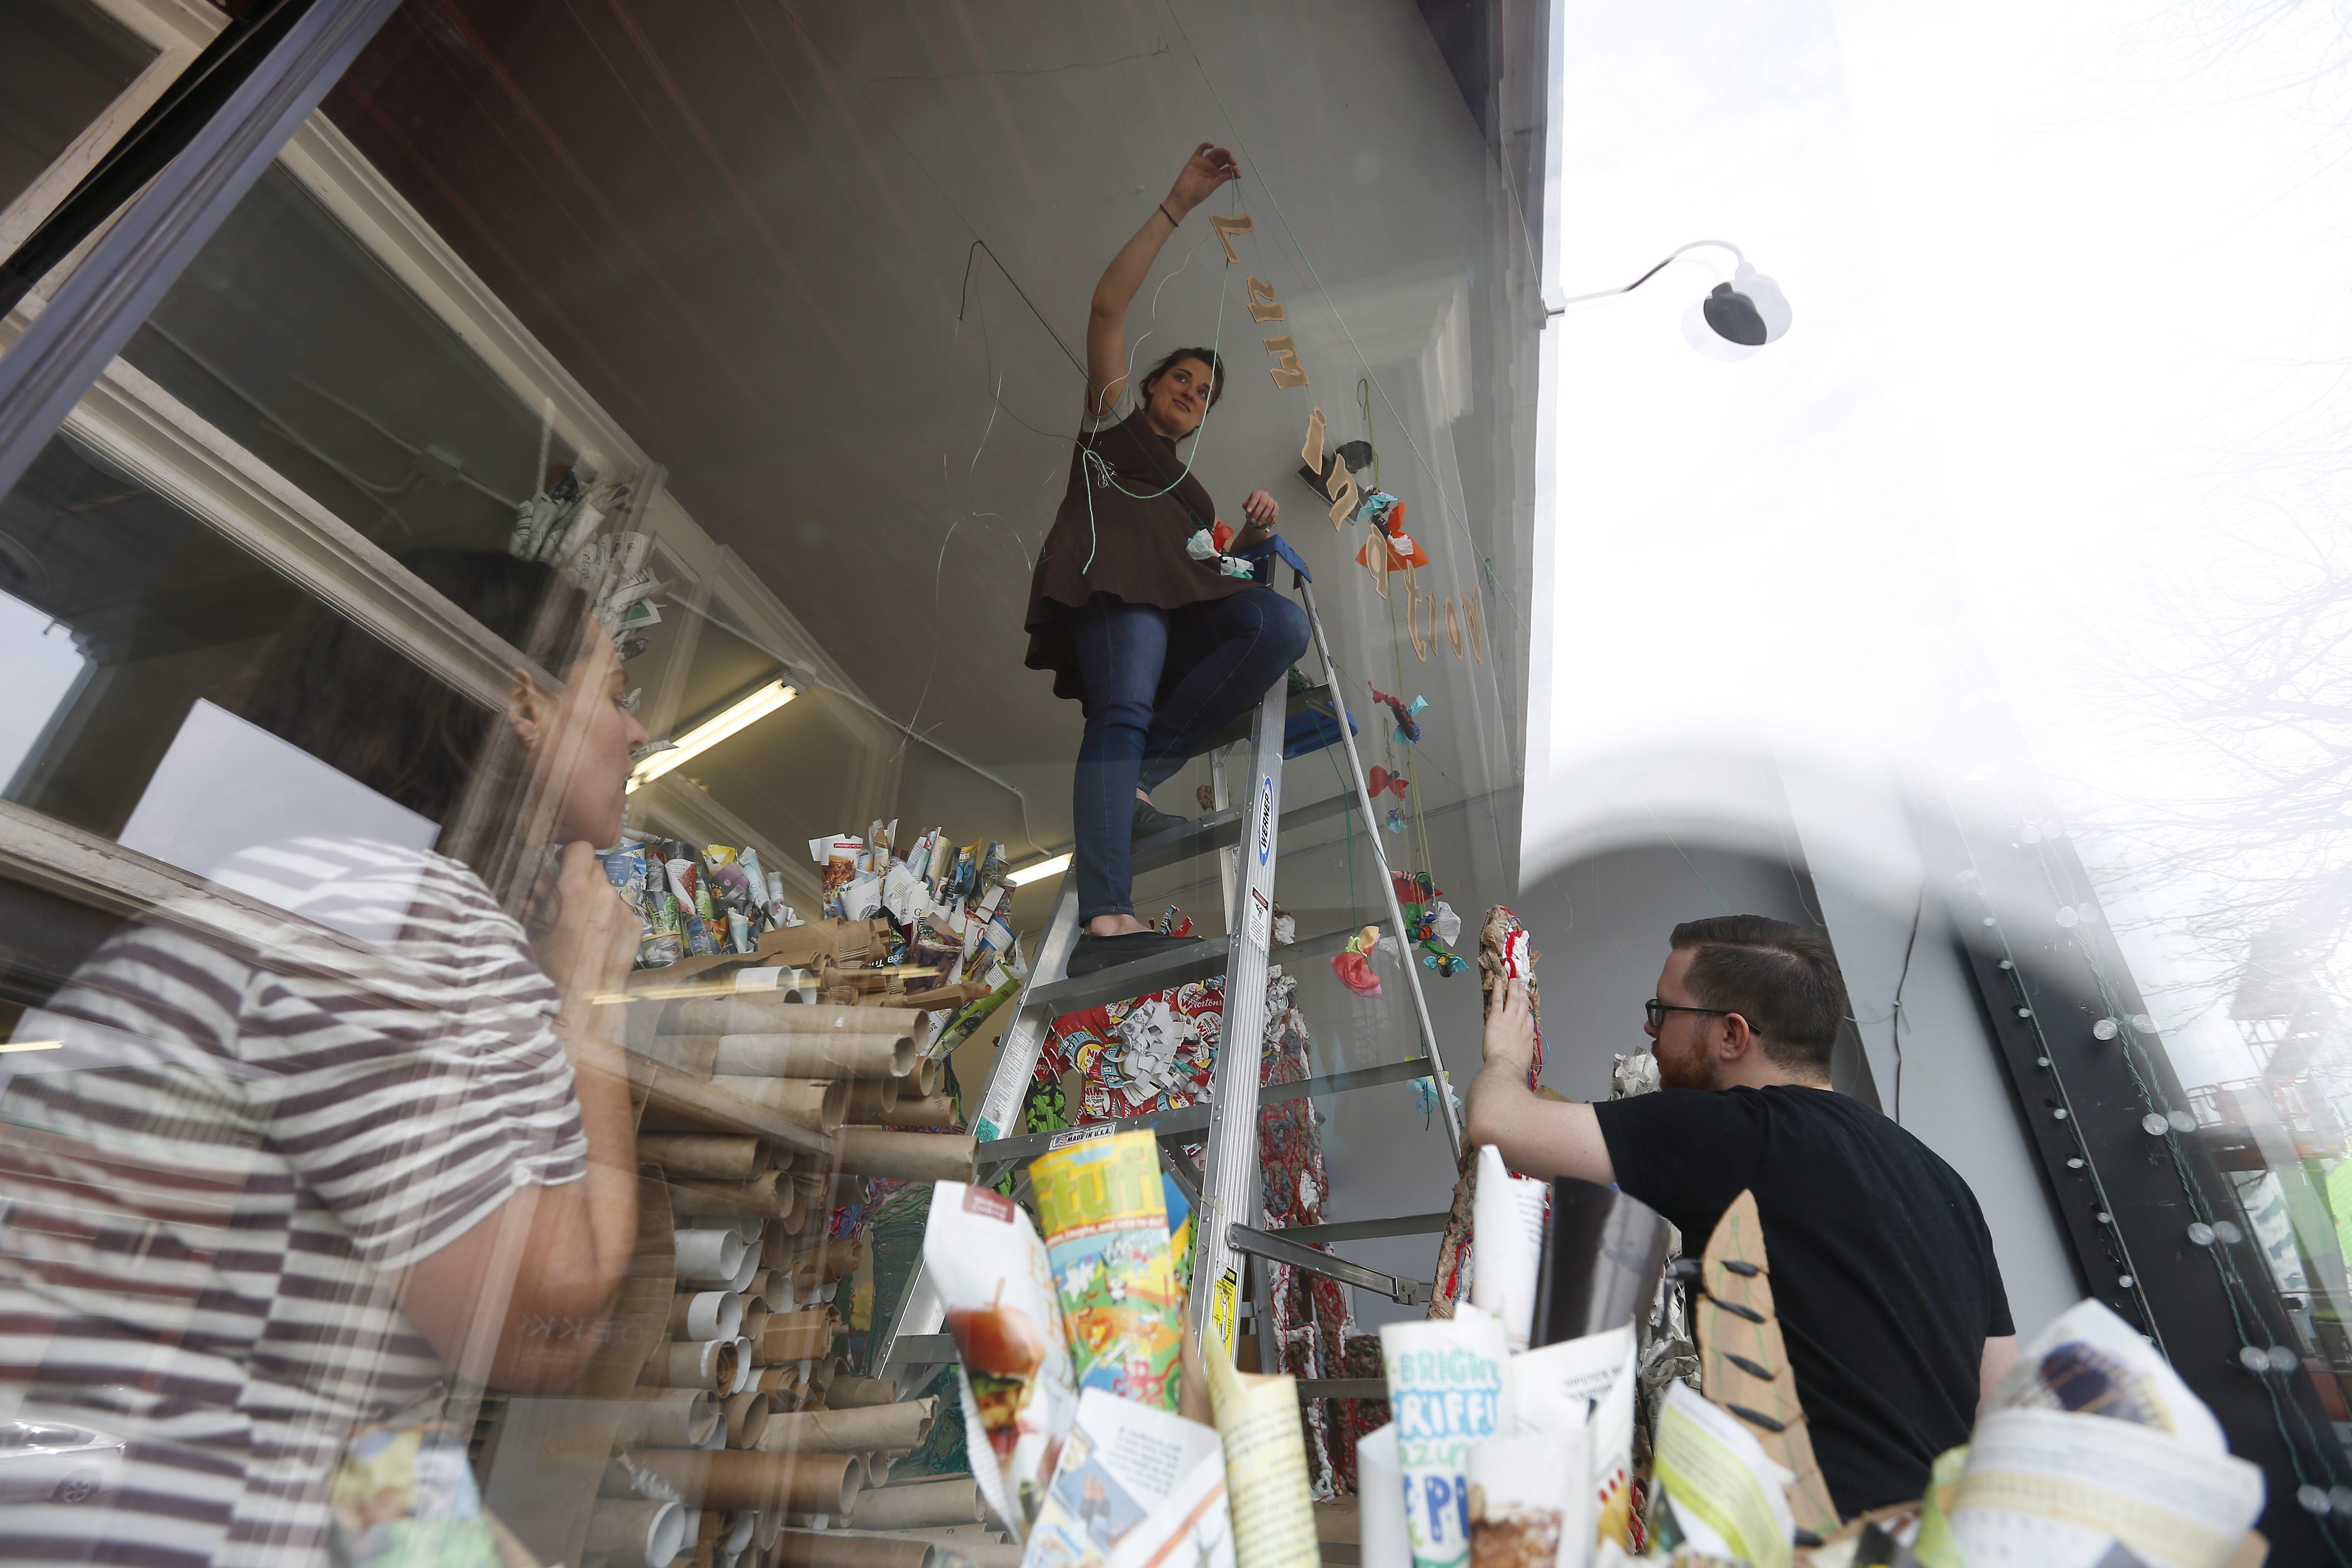 Hyatt's art store moving to Elmwood as online business grows